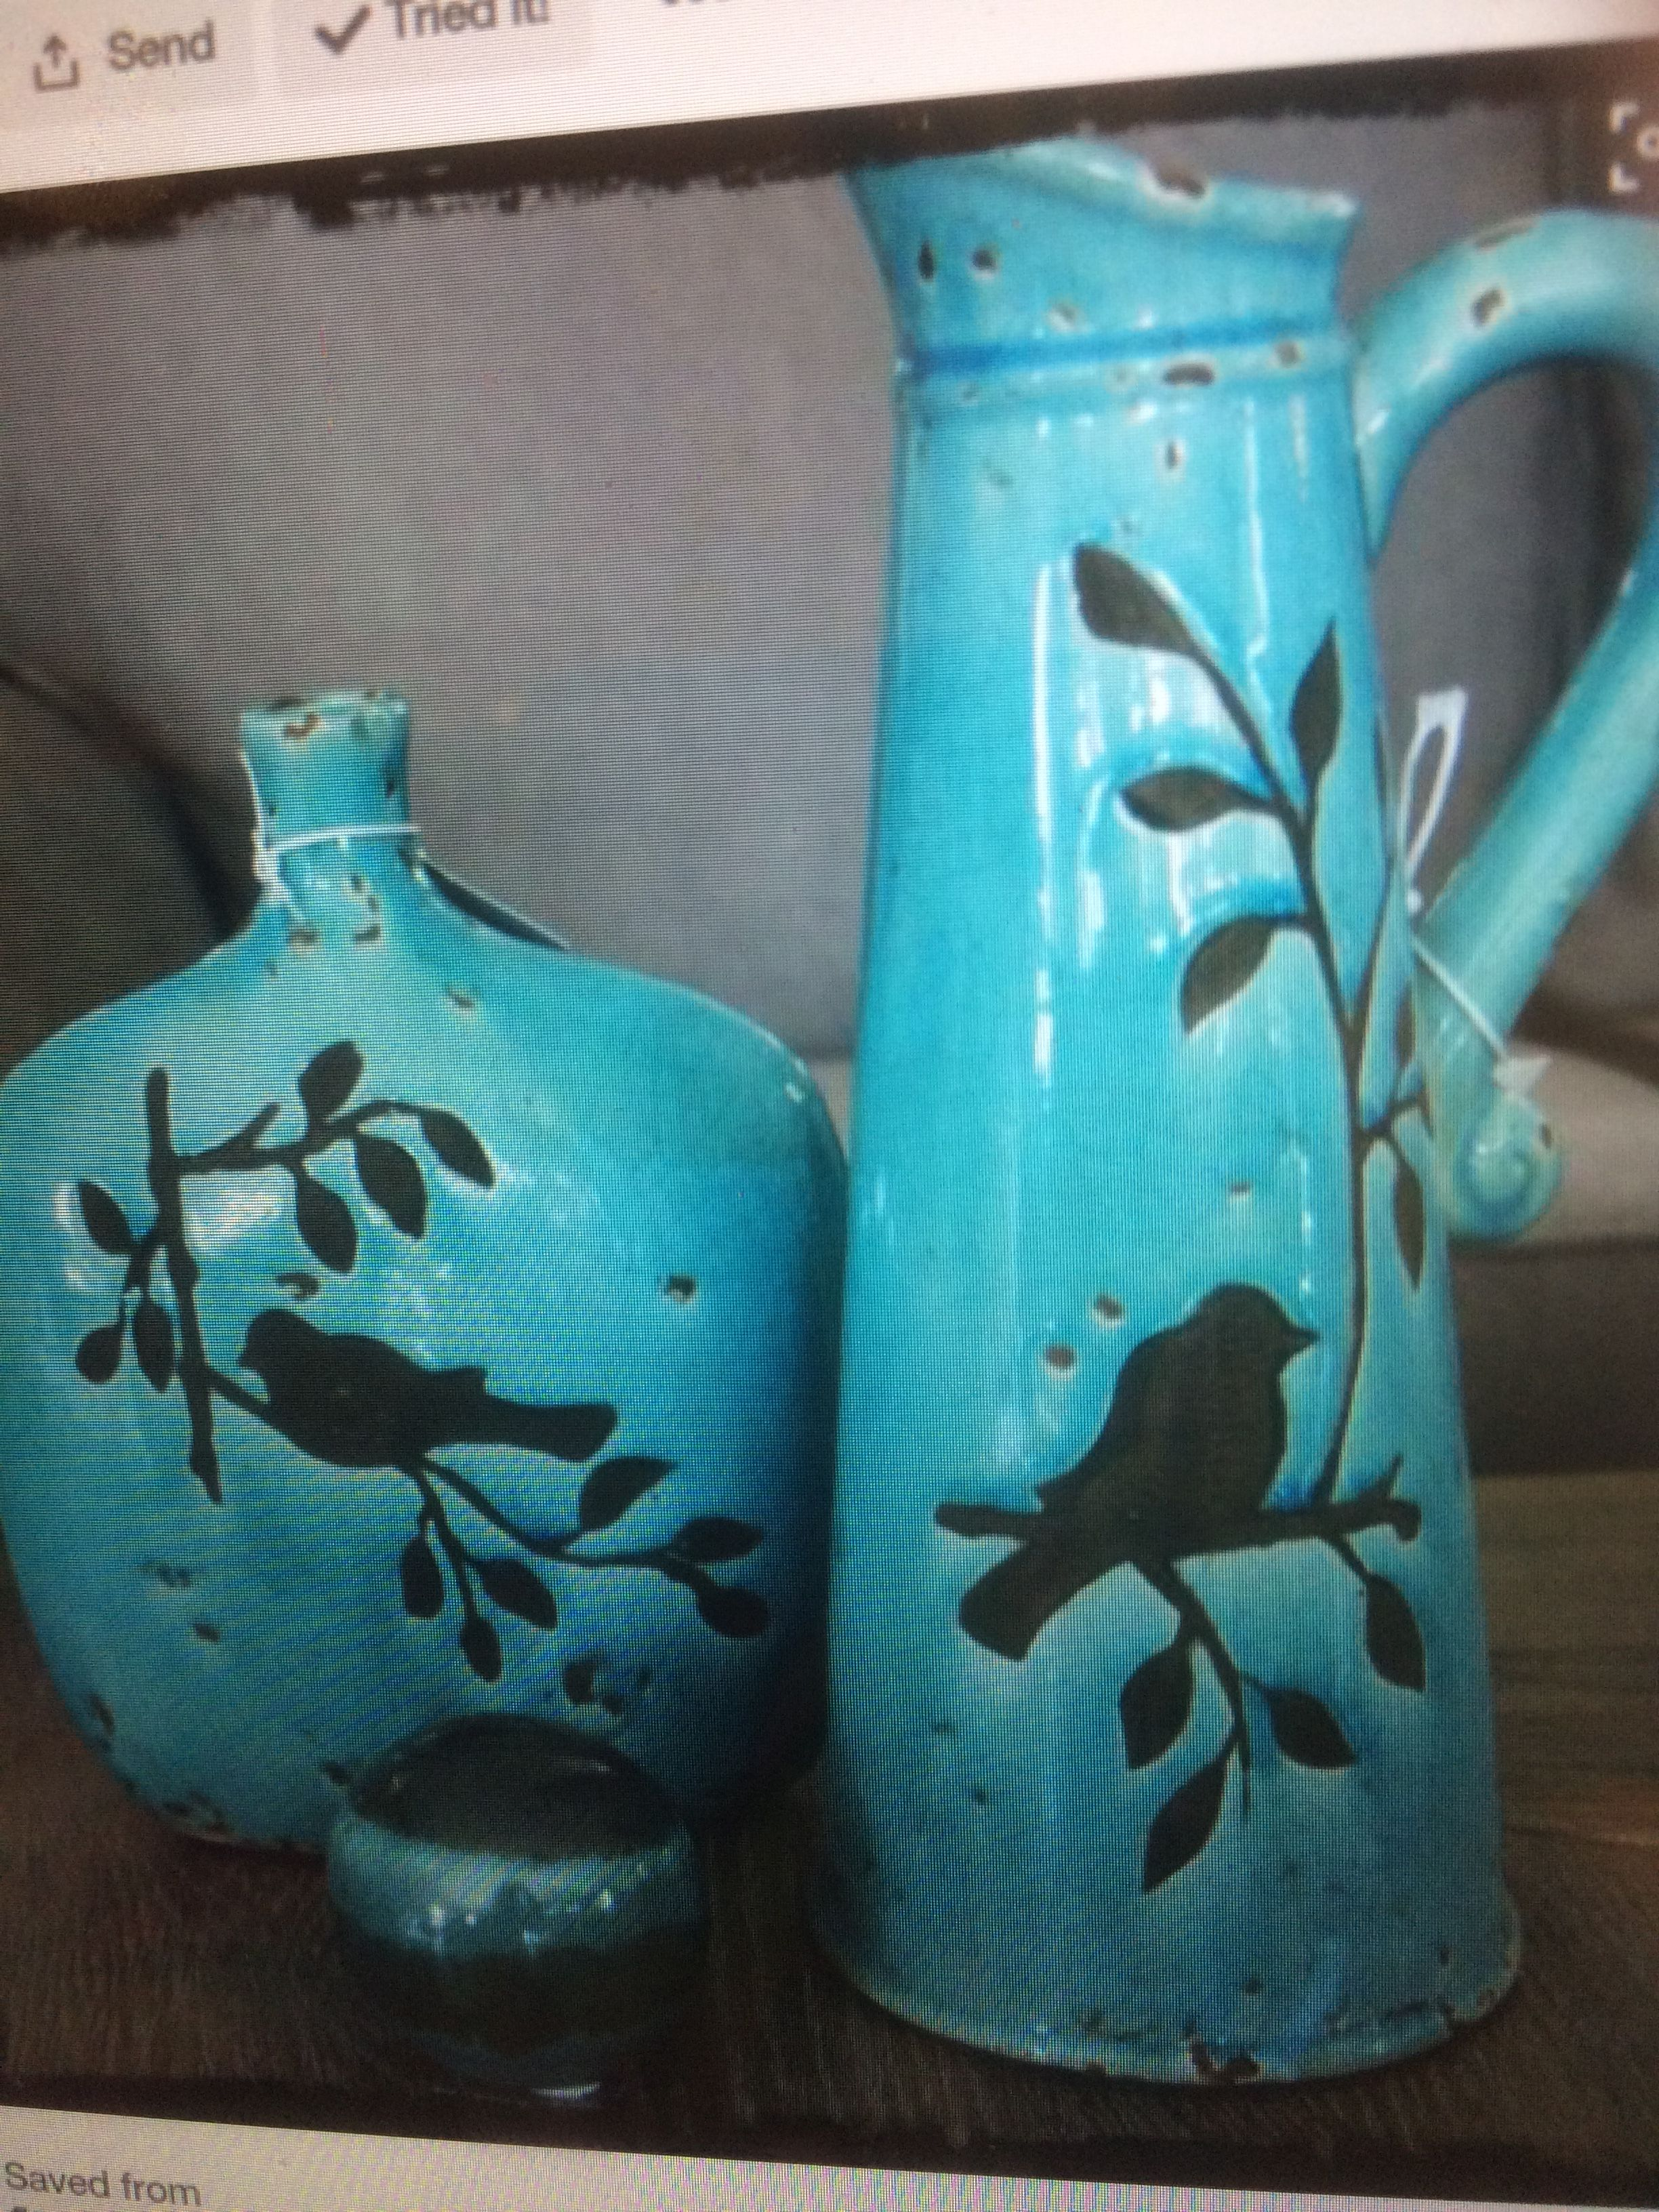 Pin By Barbara Mckenzie On Pottery Pottery Designs Ceramic Art Pottery Studio